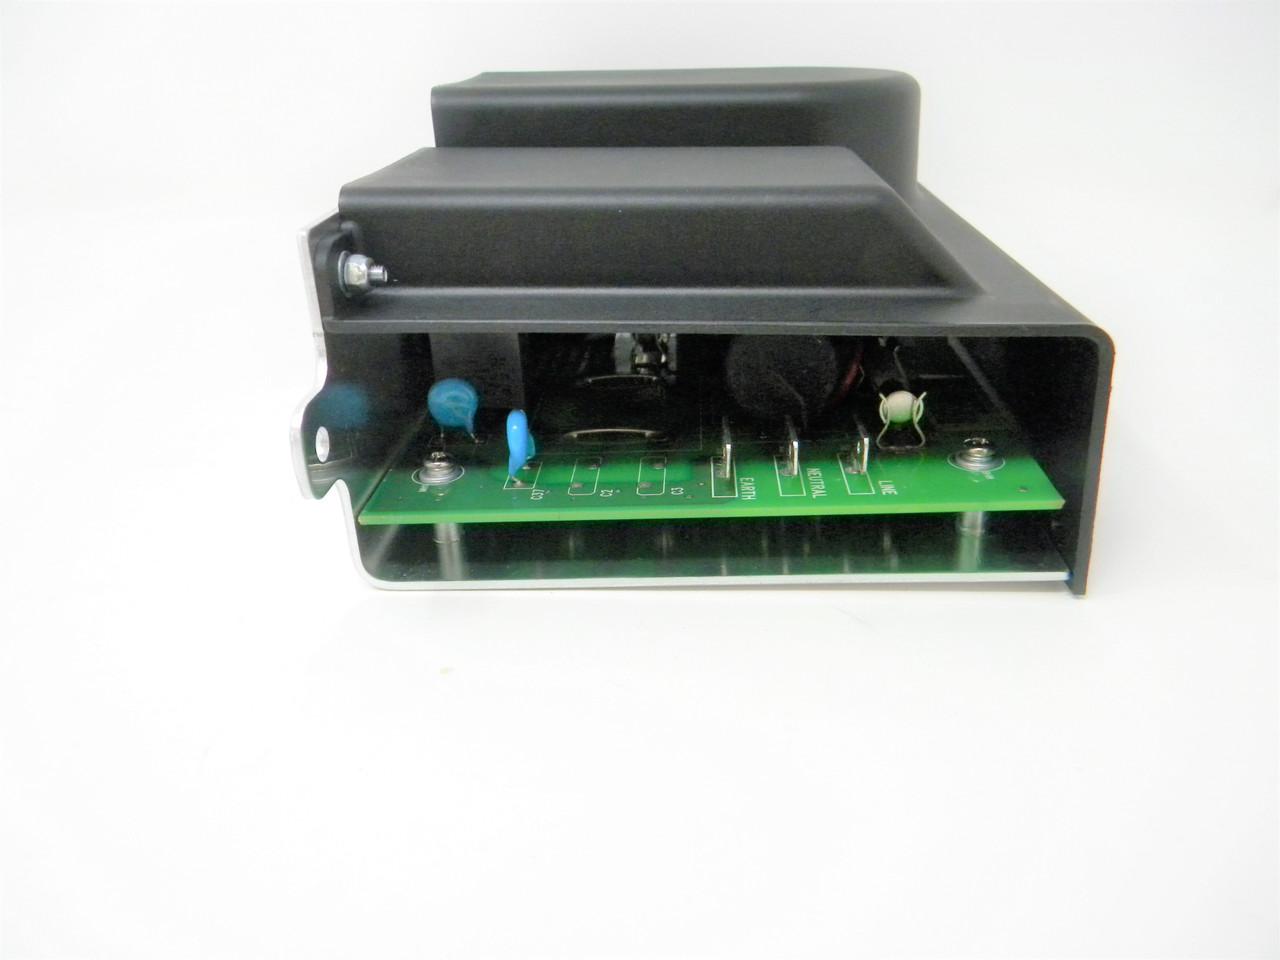 BowFlex Treadclimber Model TC100 Motor Controller Part Number 8009028